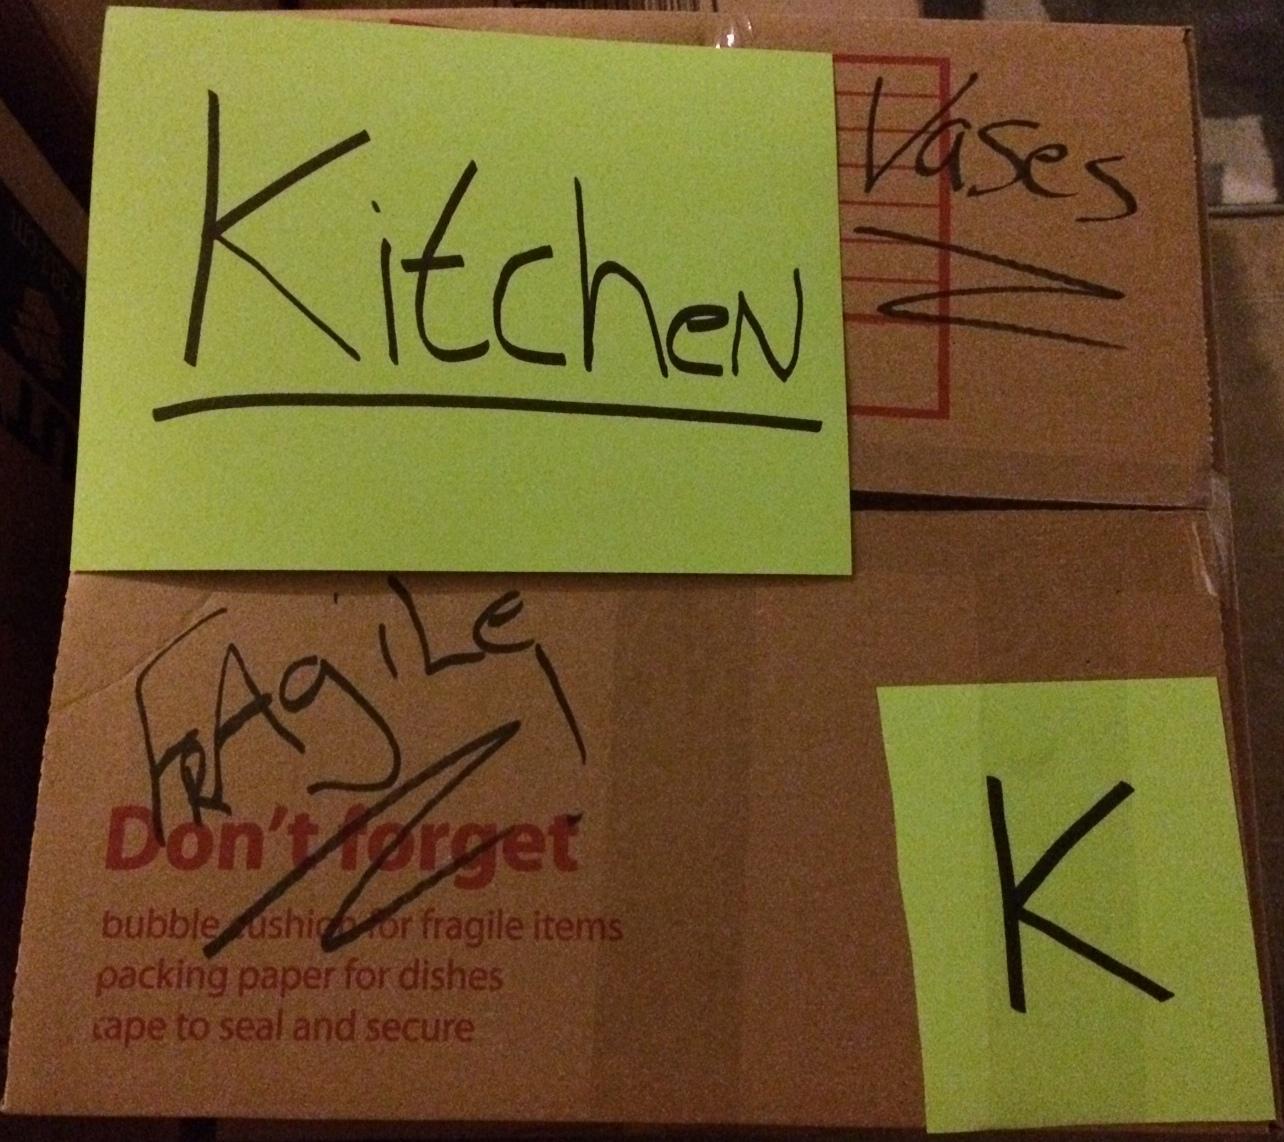 Color coordinate your box labels